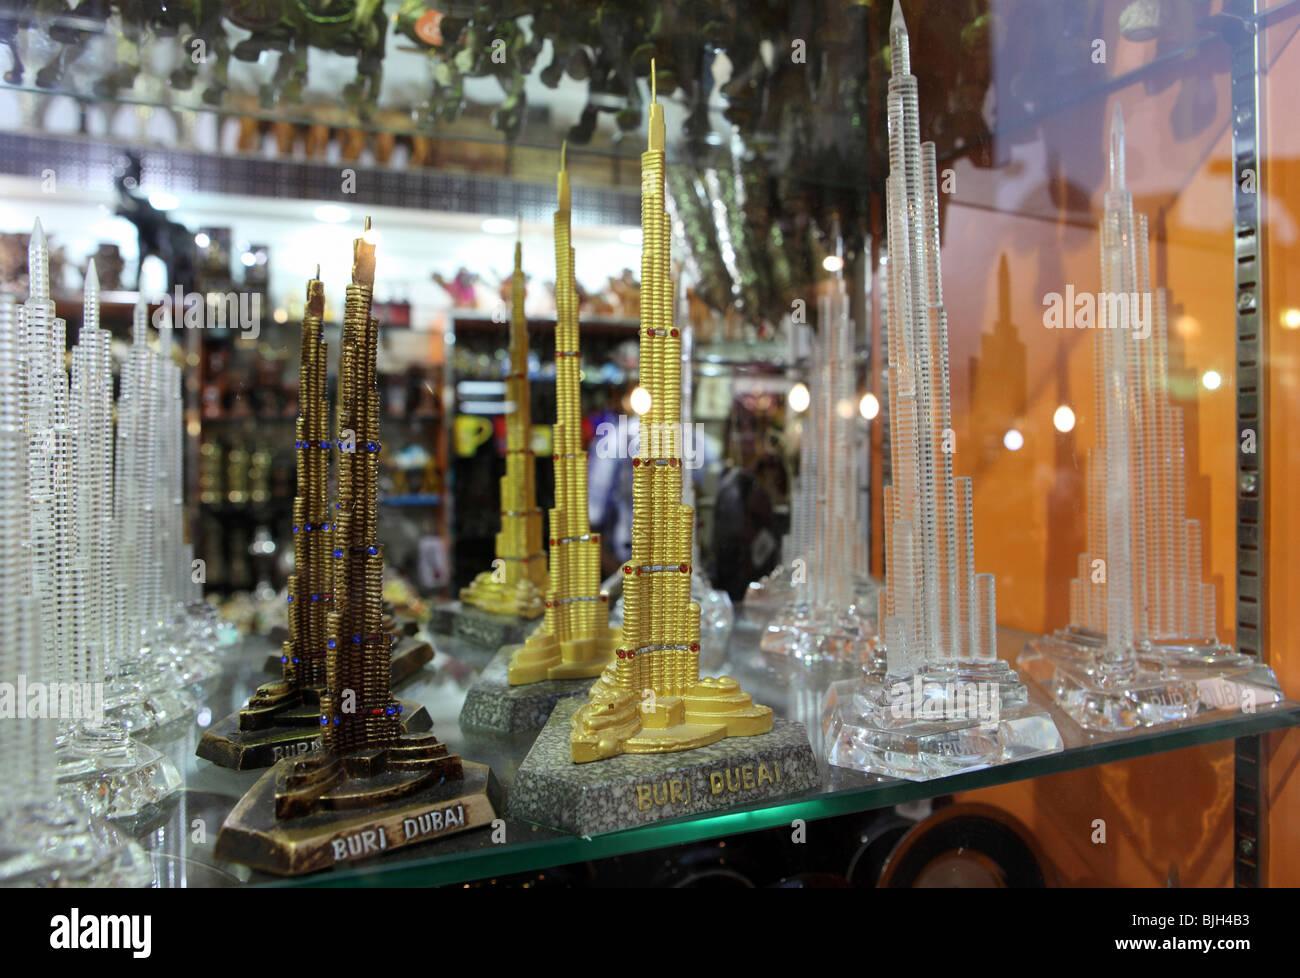 Reproductions of the Burj Dubai in a souvenir shop window, Dubai, United Arab Emirates - Stock Image